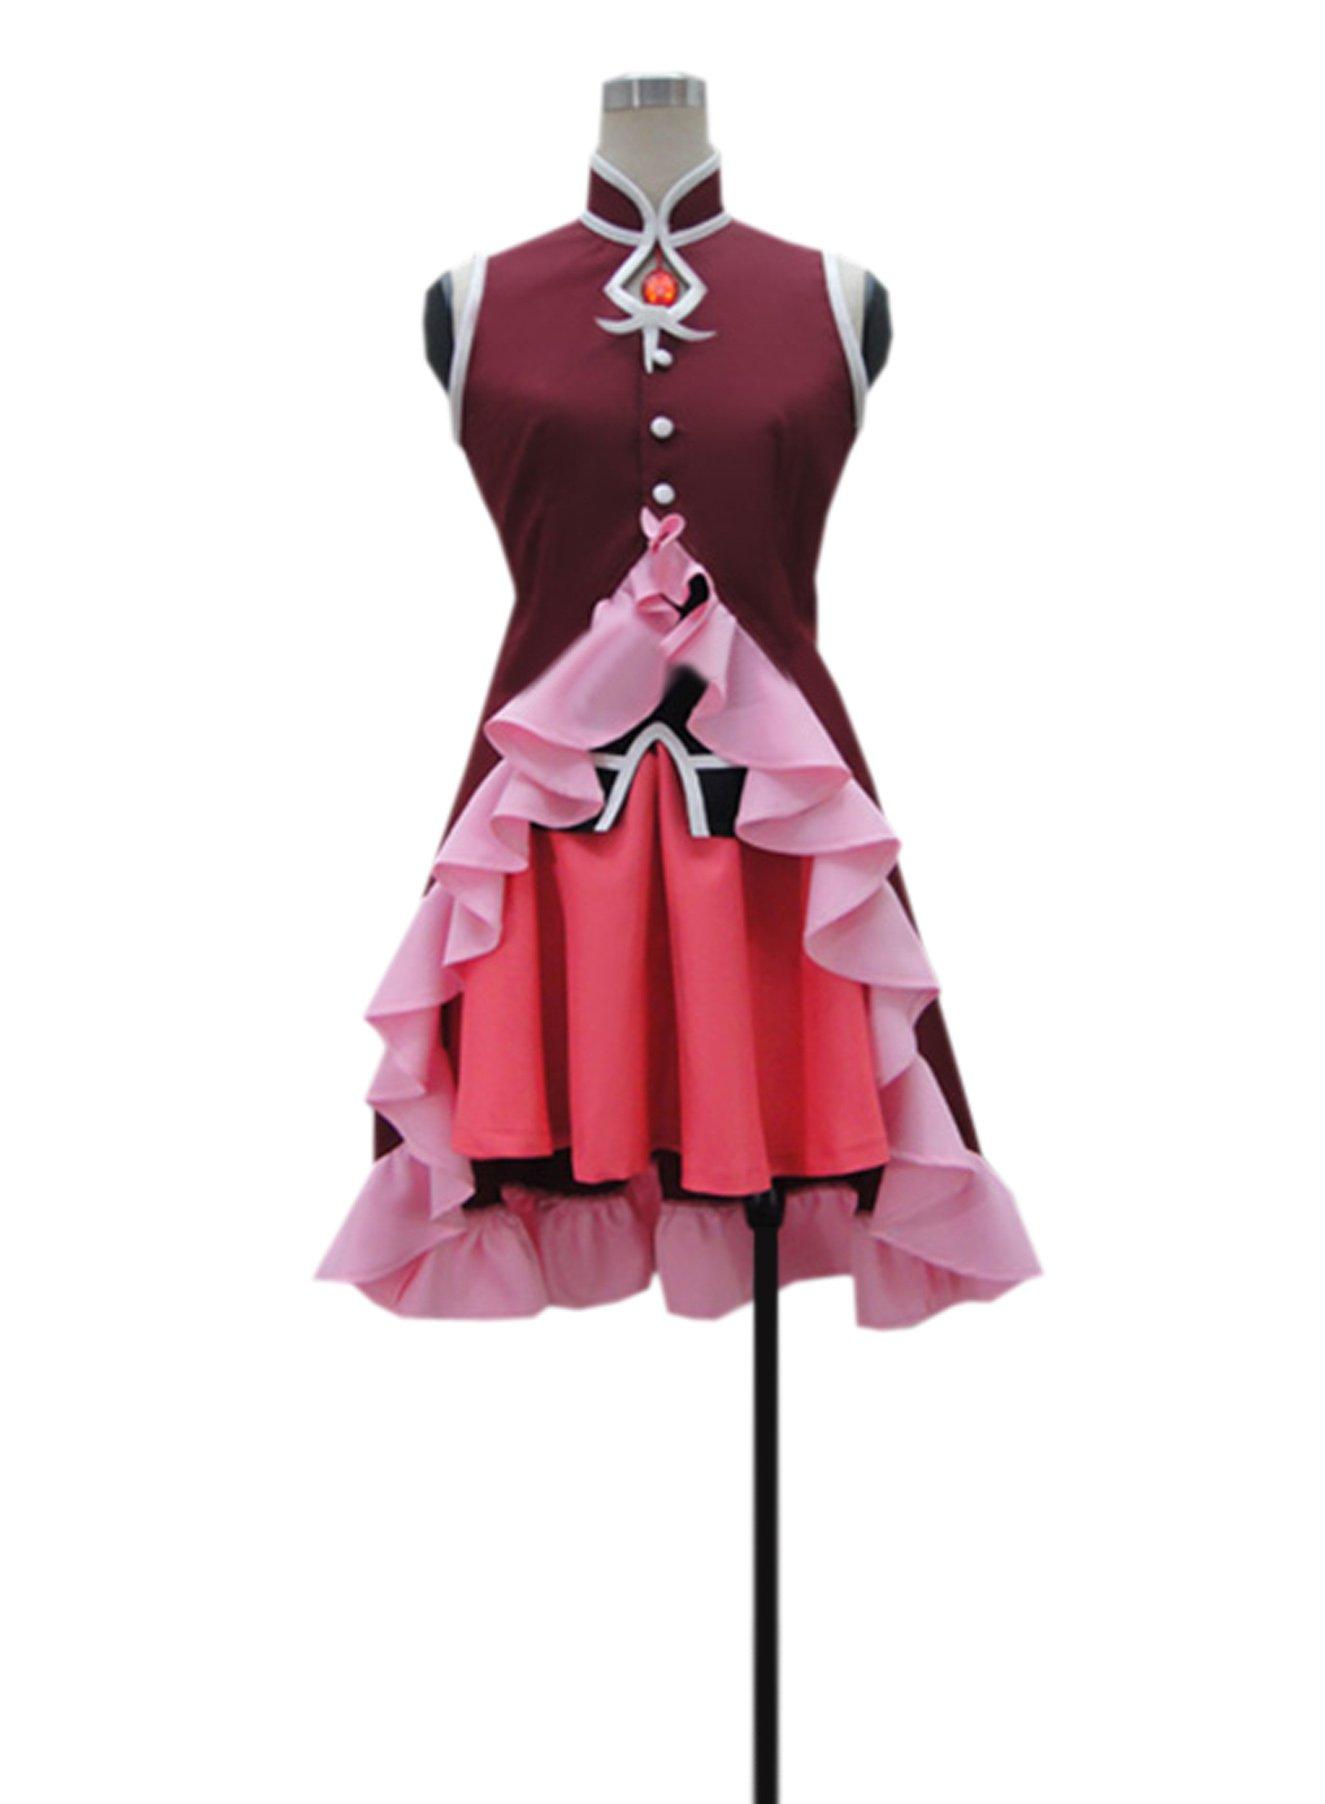 Dreamcosplay Anime Puella Magi Madoka Magica Sakura Kyouko Outfits Cosplay